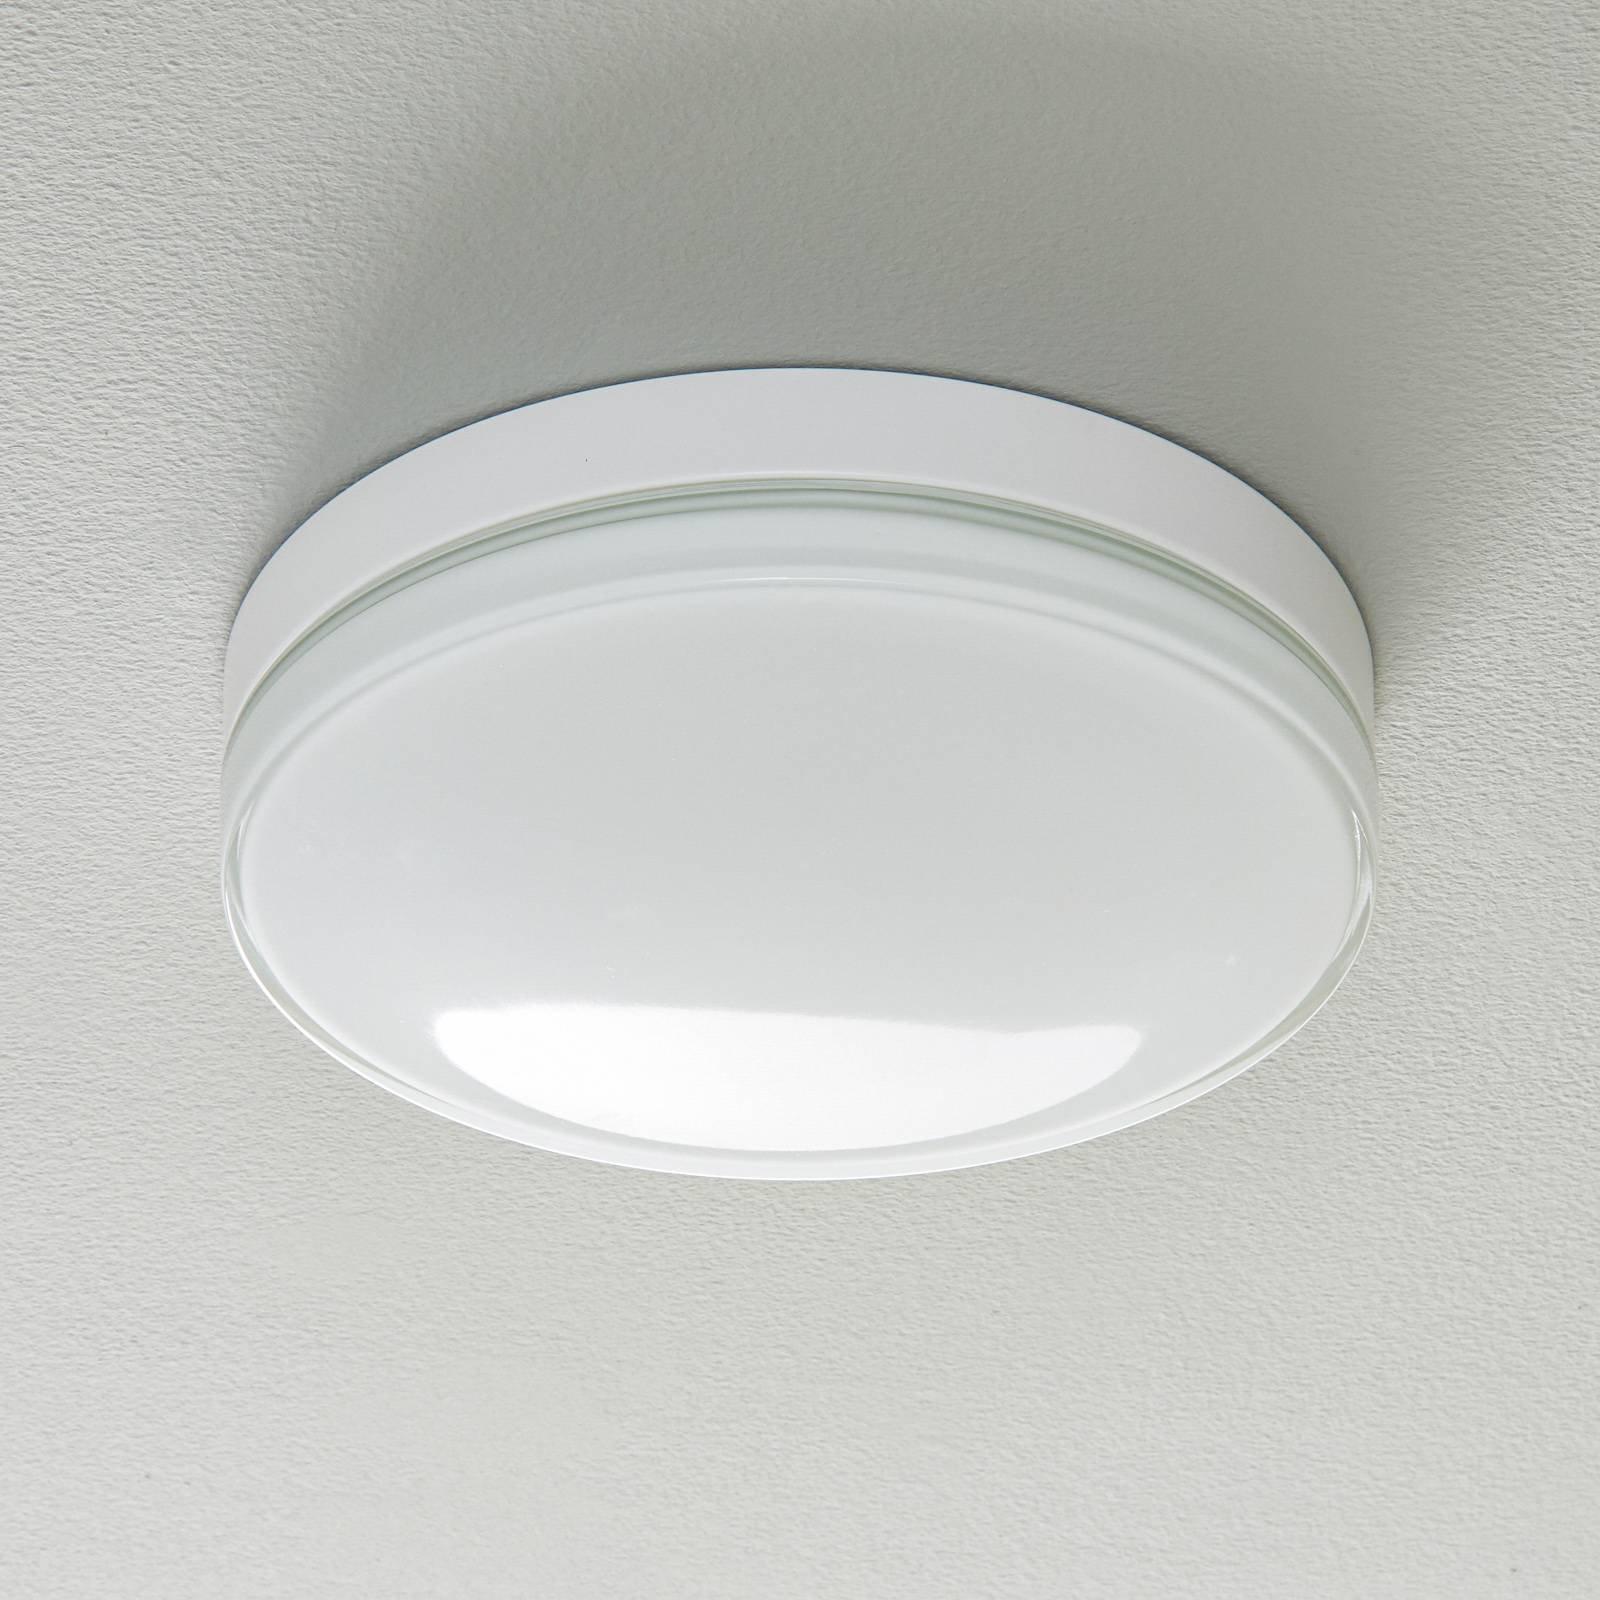 BEGA 12128 LED-taklampe DALI 930 hvit 30,5cm